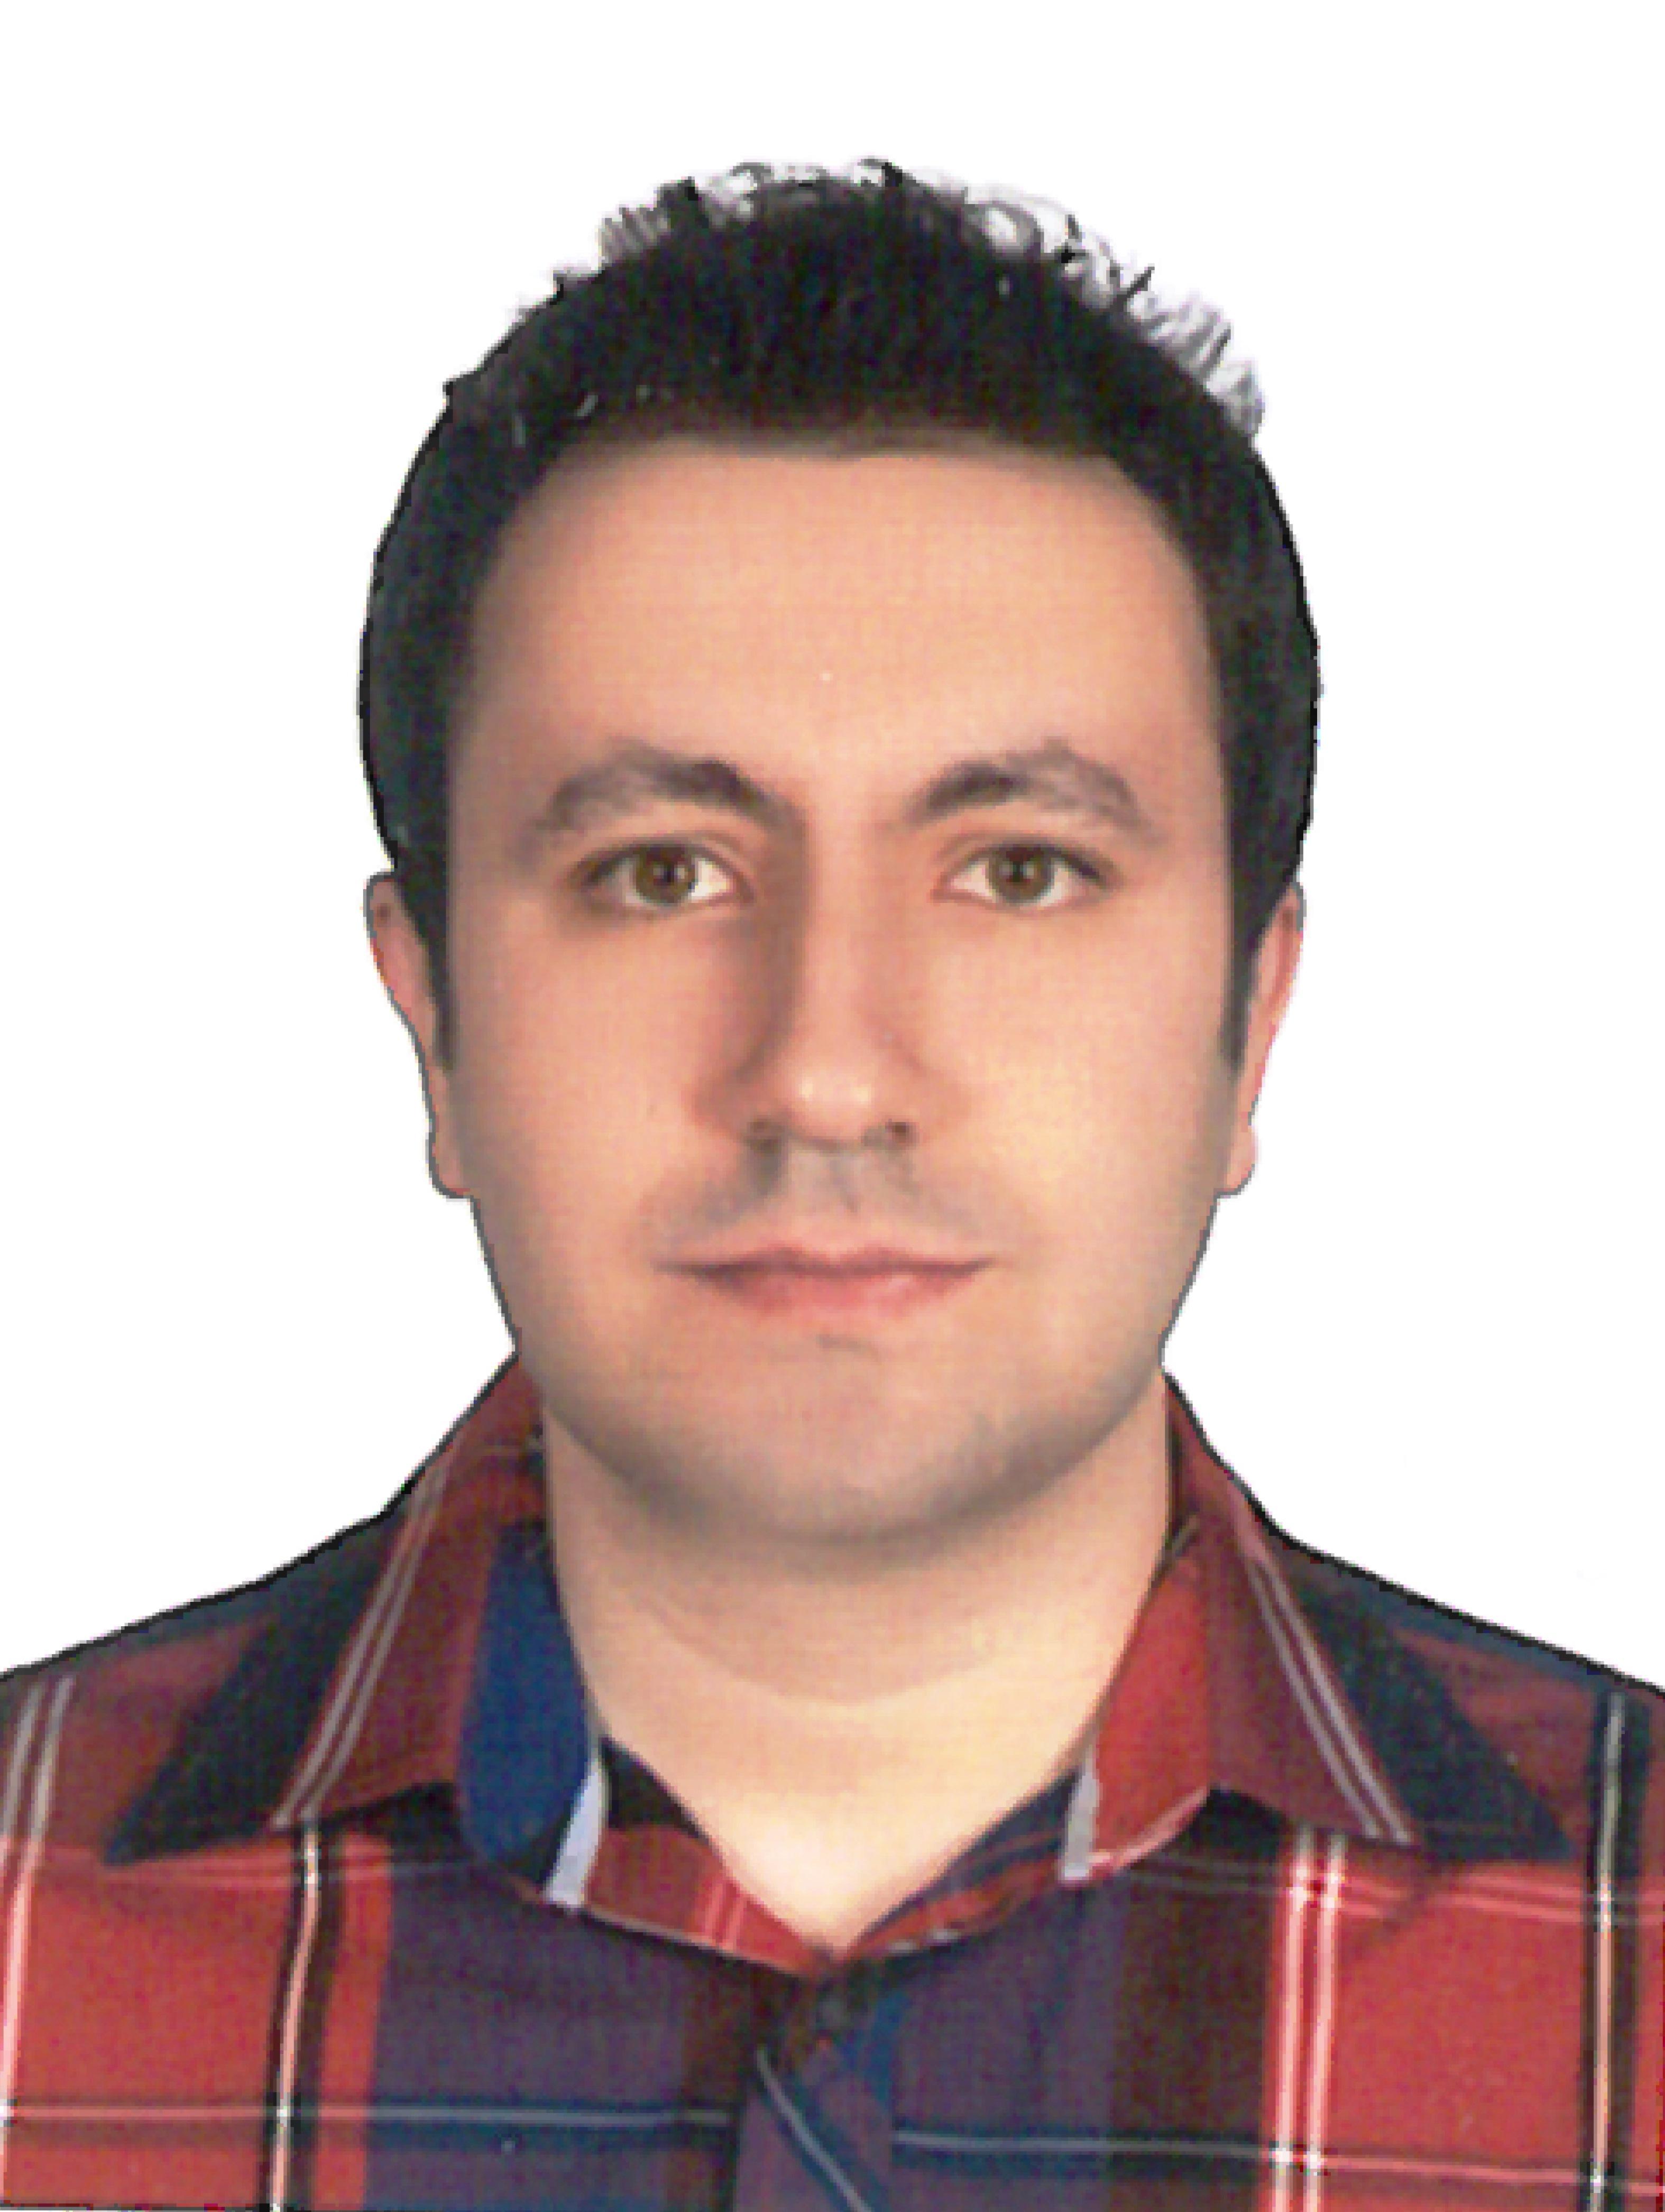 Mr. Farokhmanesh TC 39